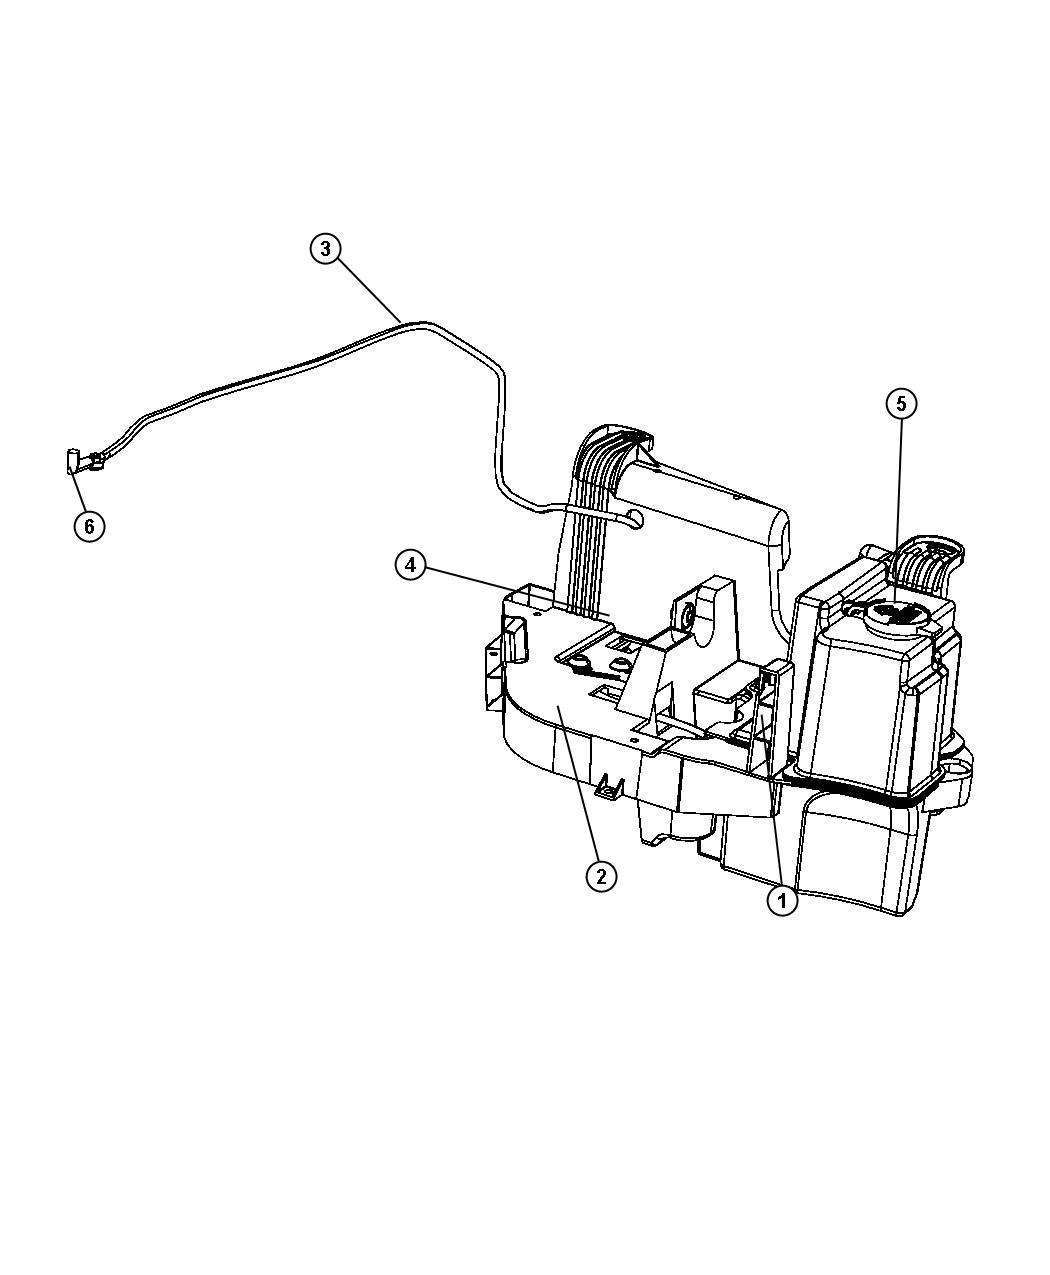 Chrysler 200 Pump Washer Windshield Wiperwasherheavy